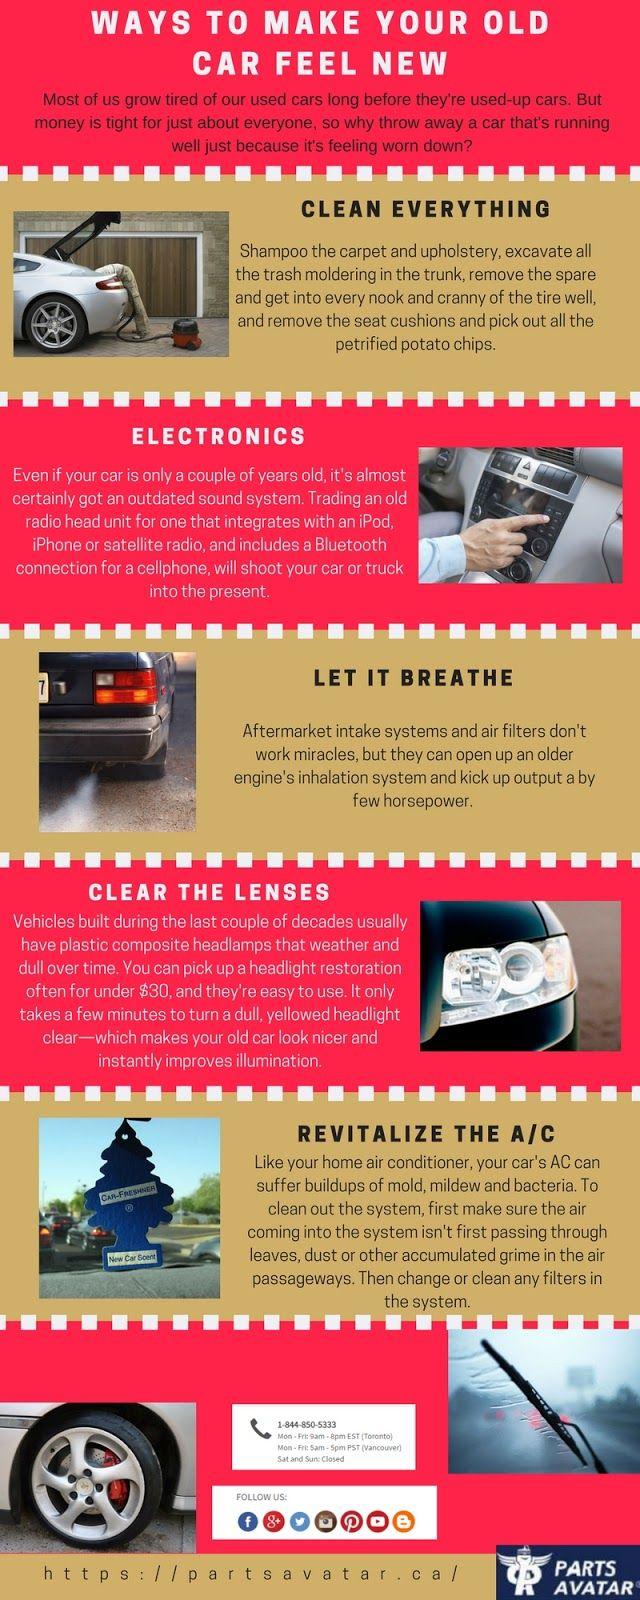 561 best Know-how car images on Pinterest | Car stuff, A website ...